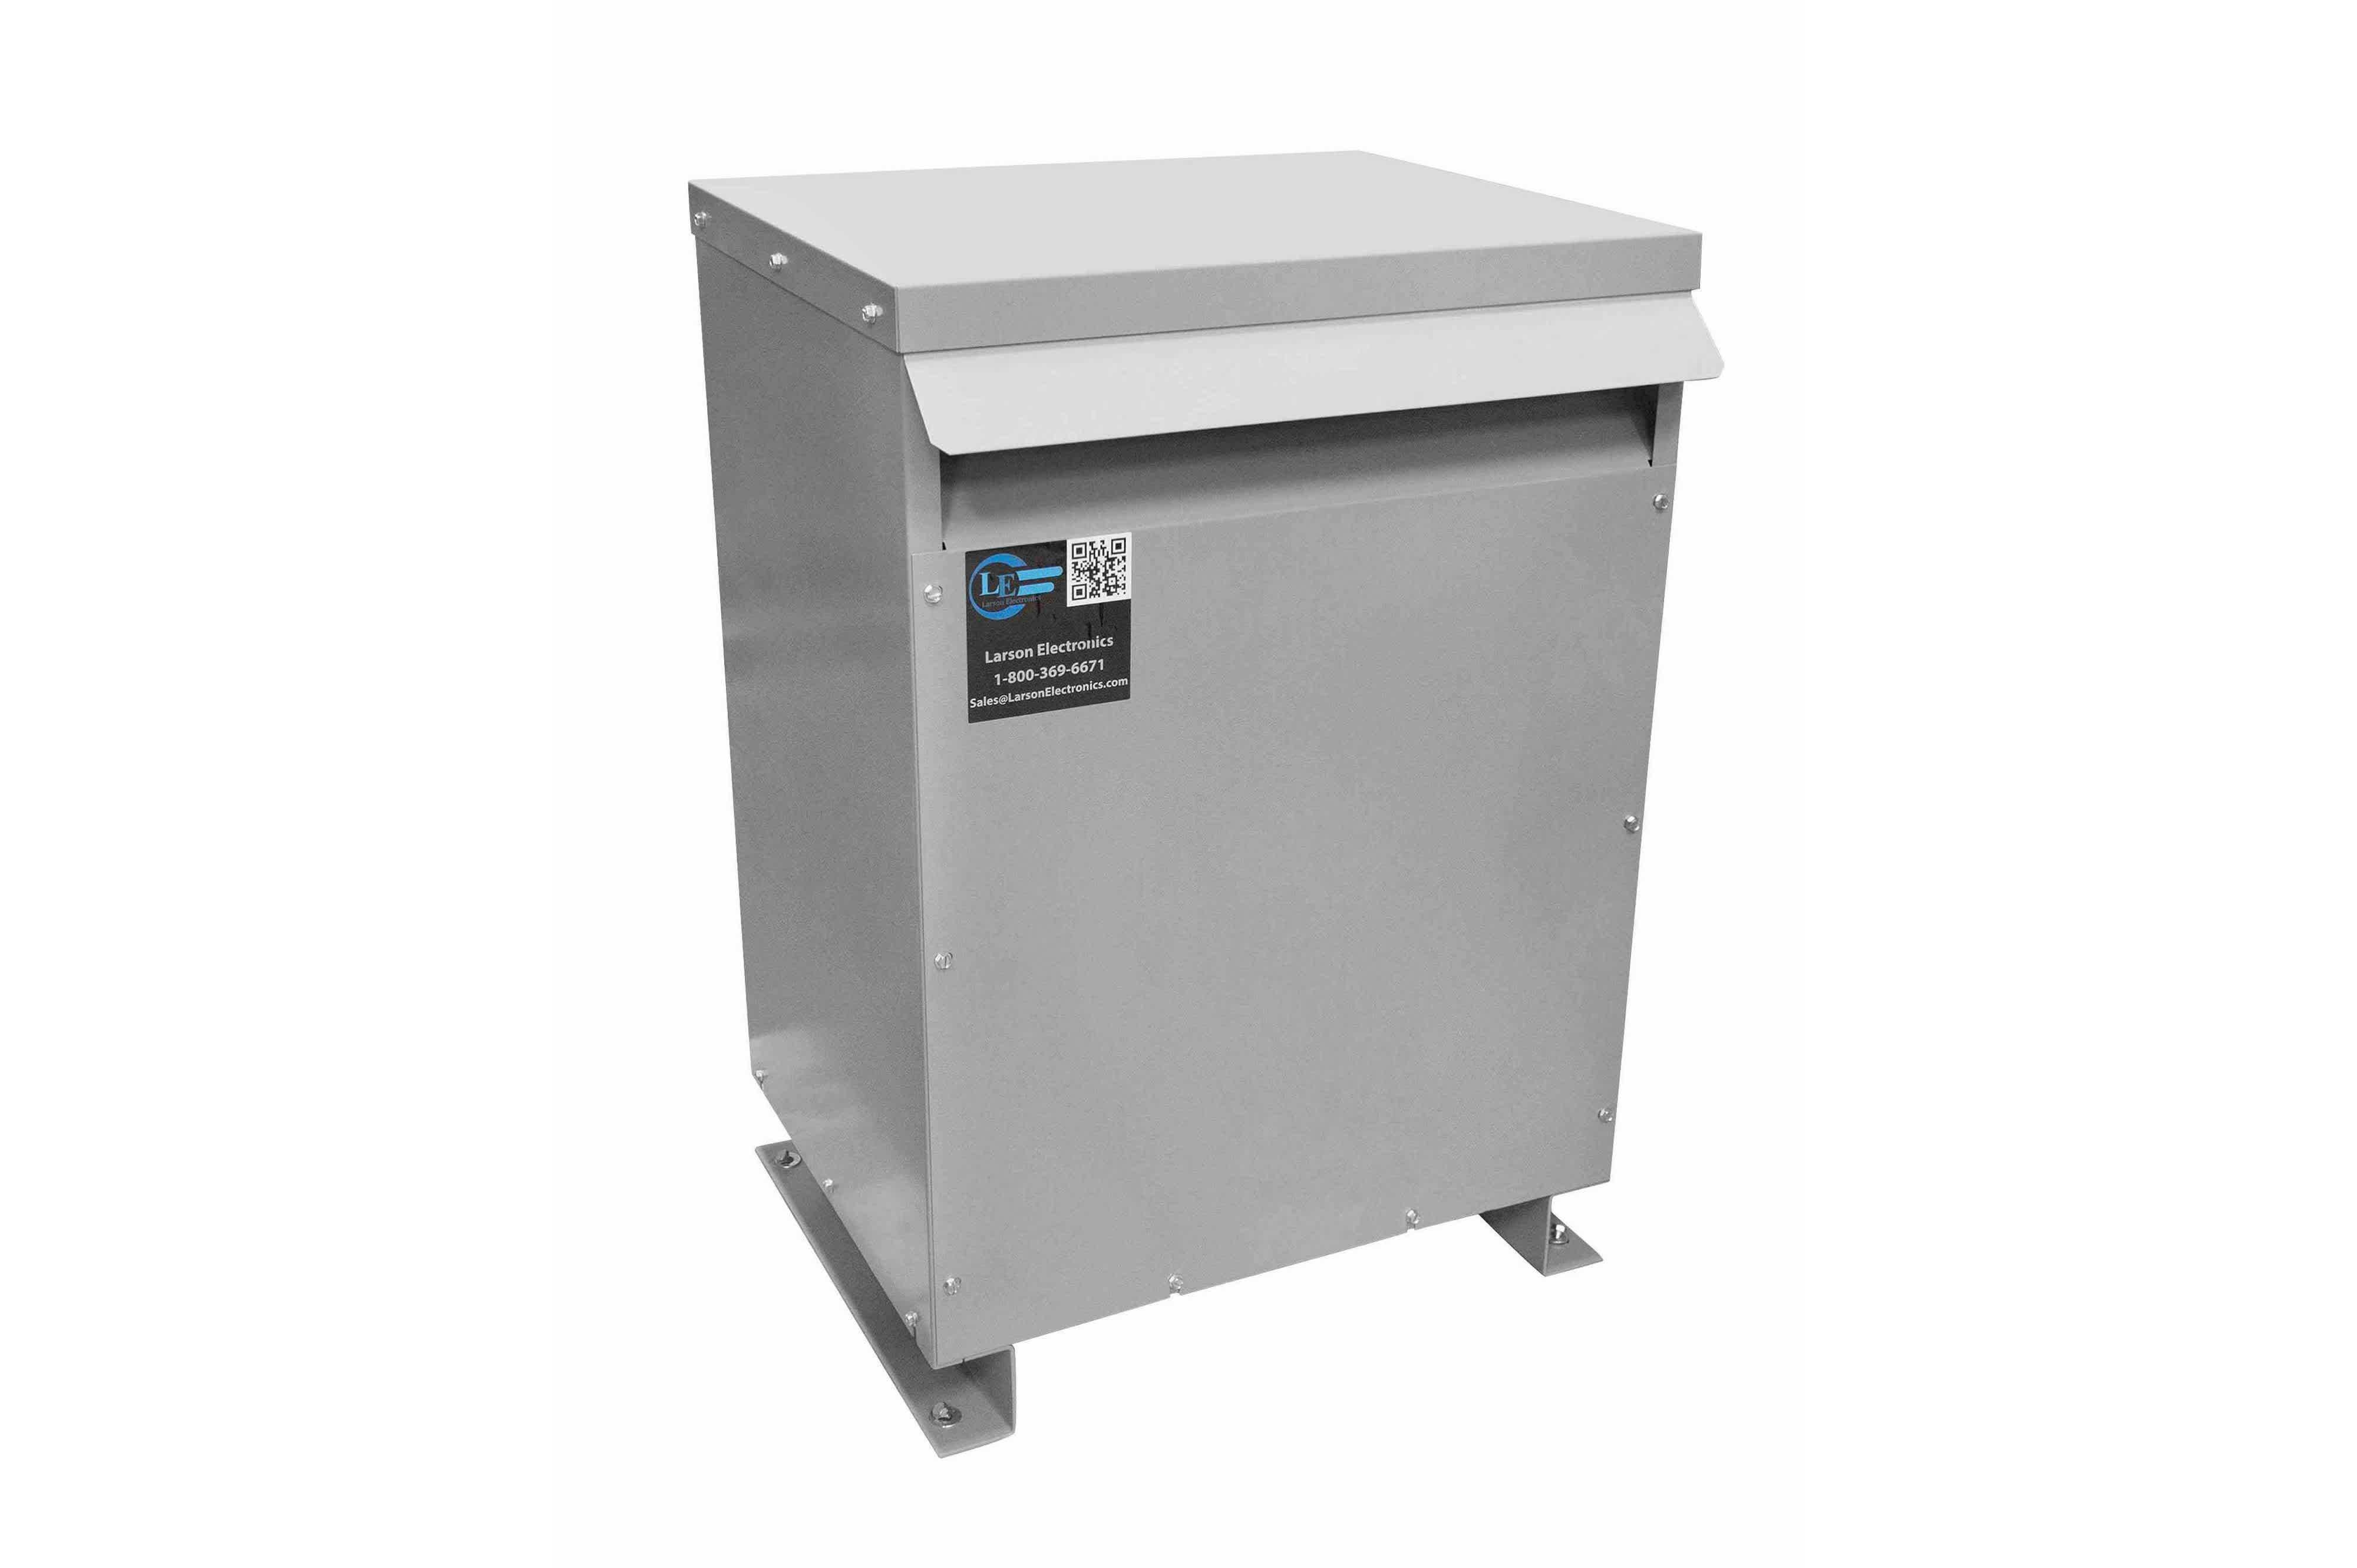 167 kVA 3PH Isolation Transformer, 220V Wye Primary, 480V Delta Secondary, N3R, Ventilated, 60 Hz